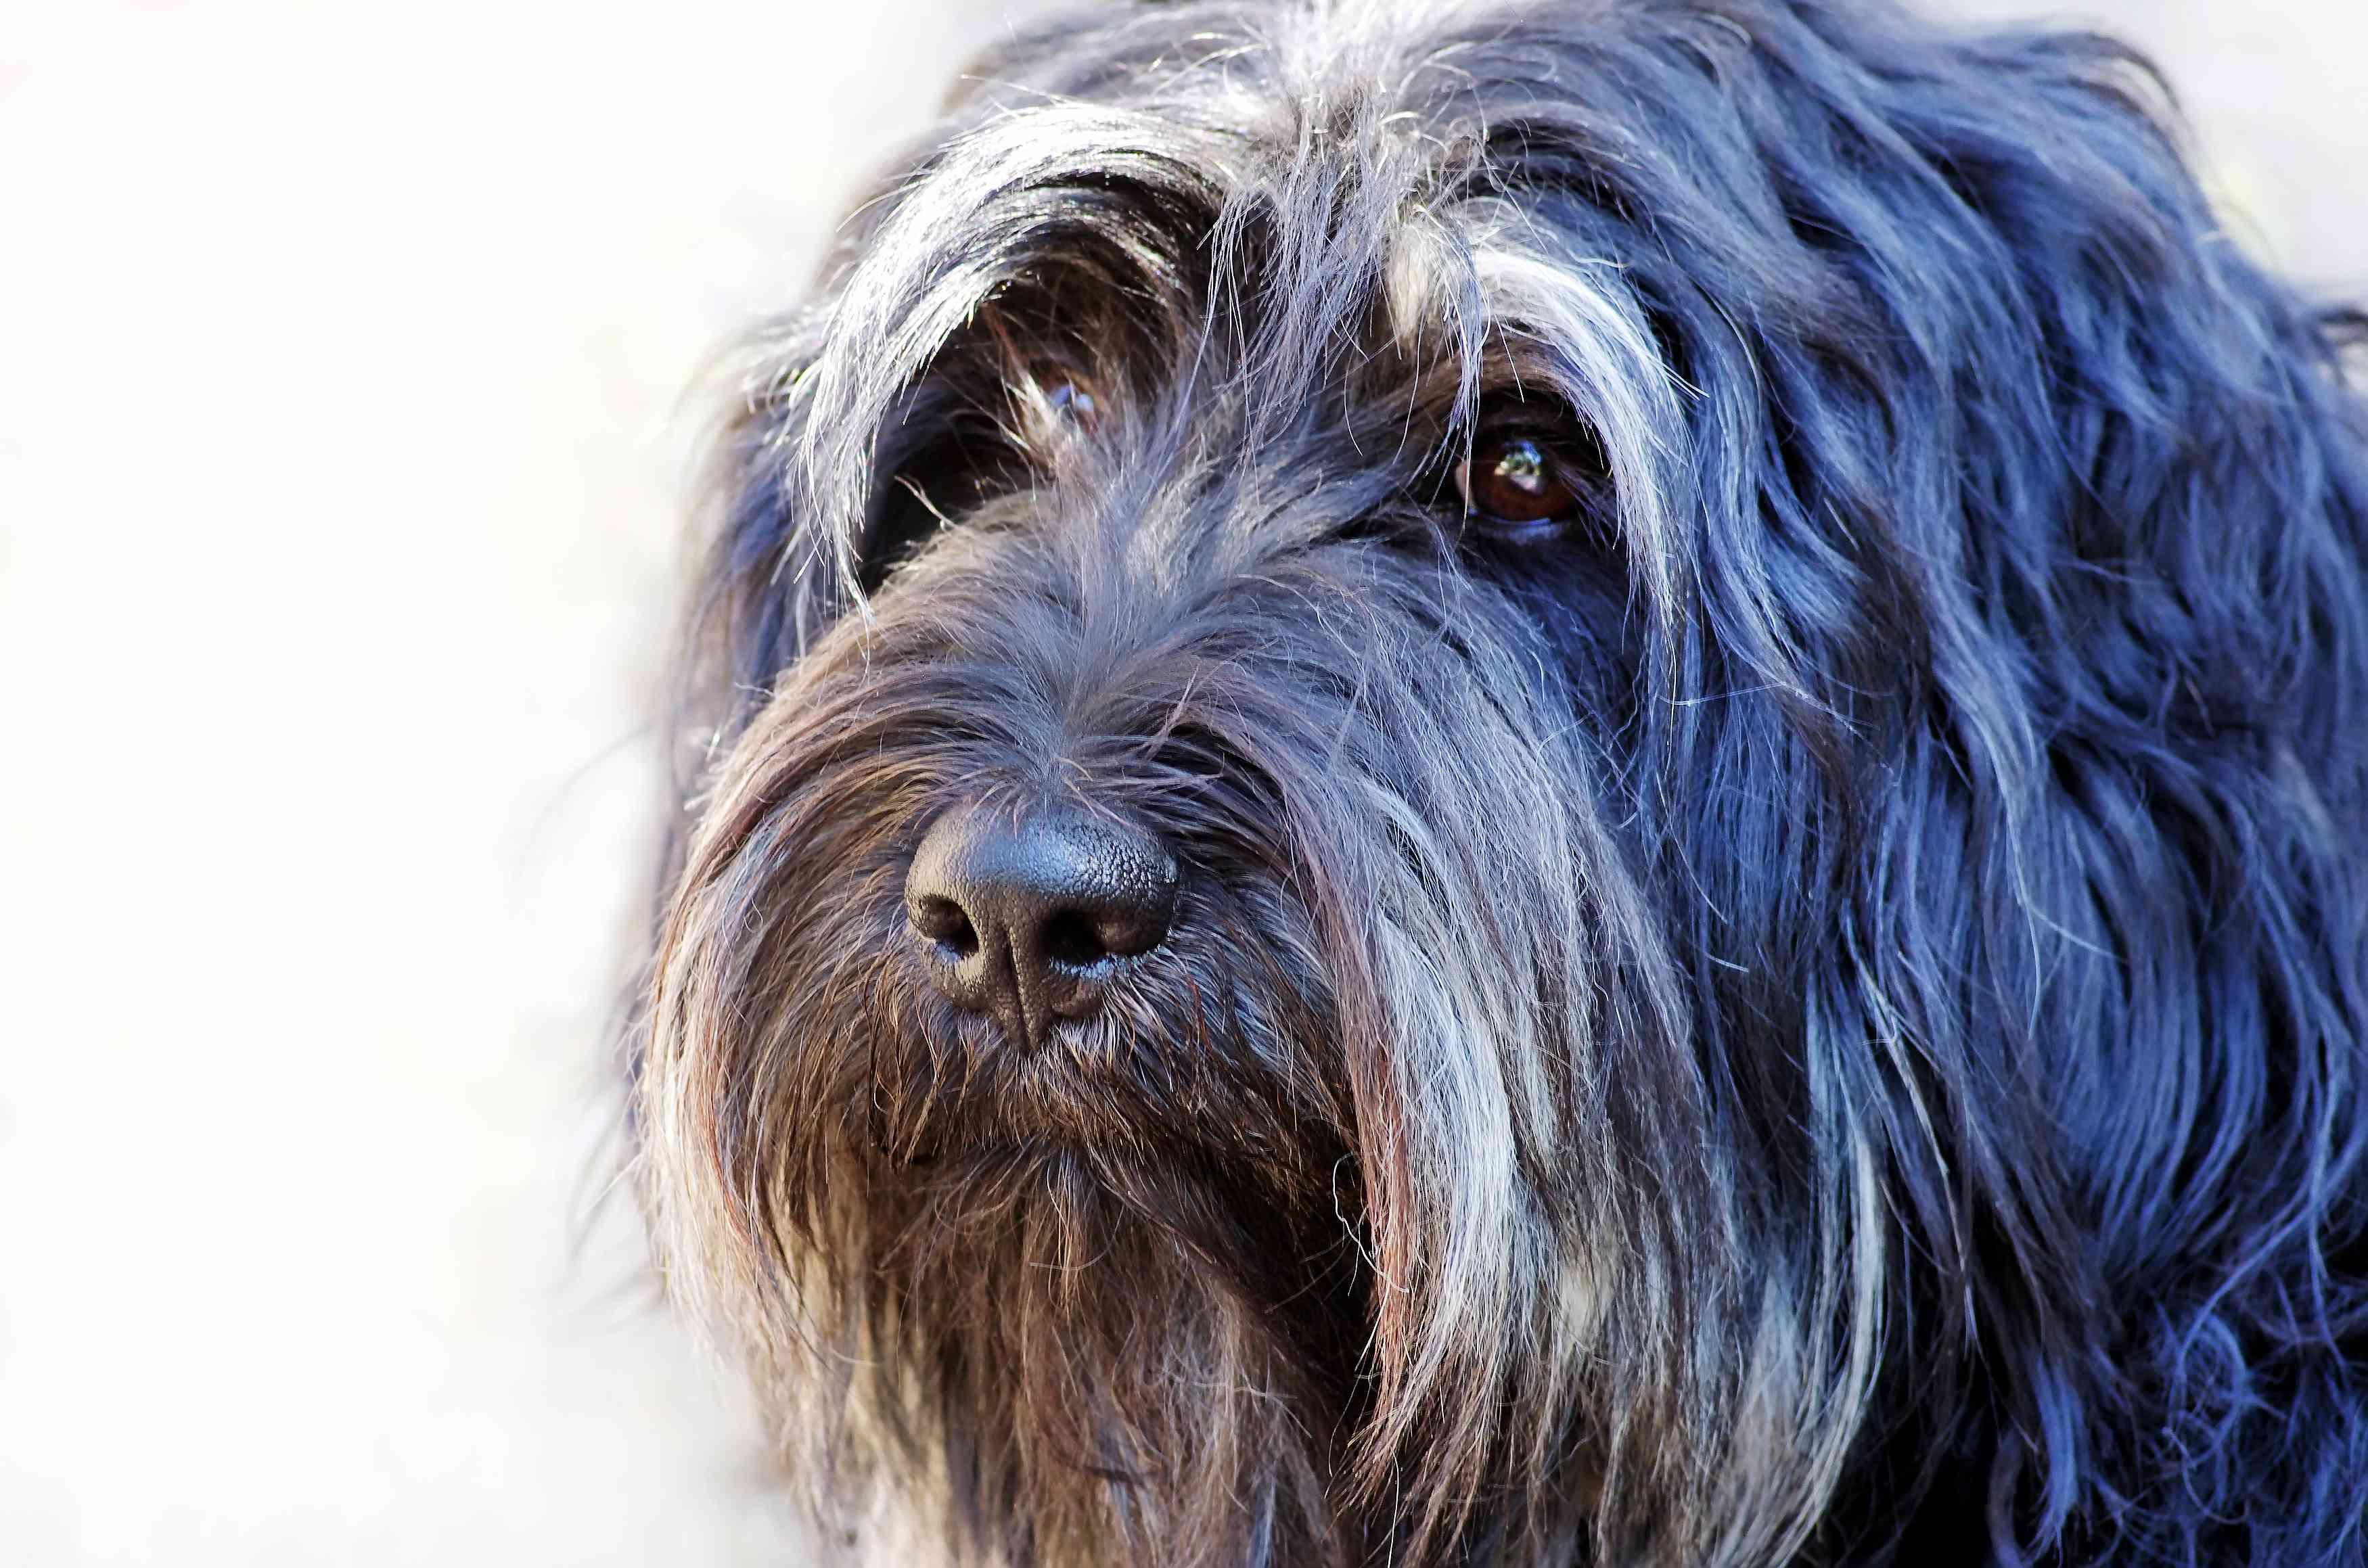 Portuguese sheepdog portrait